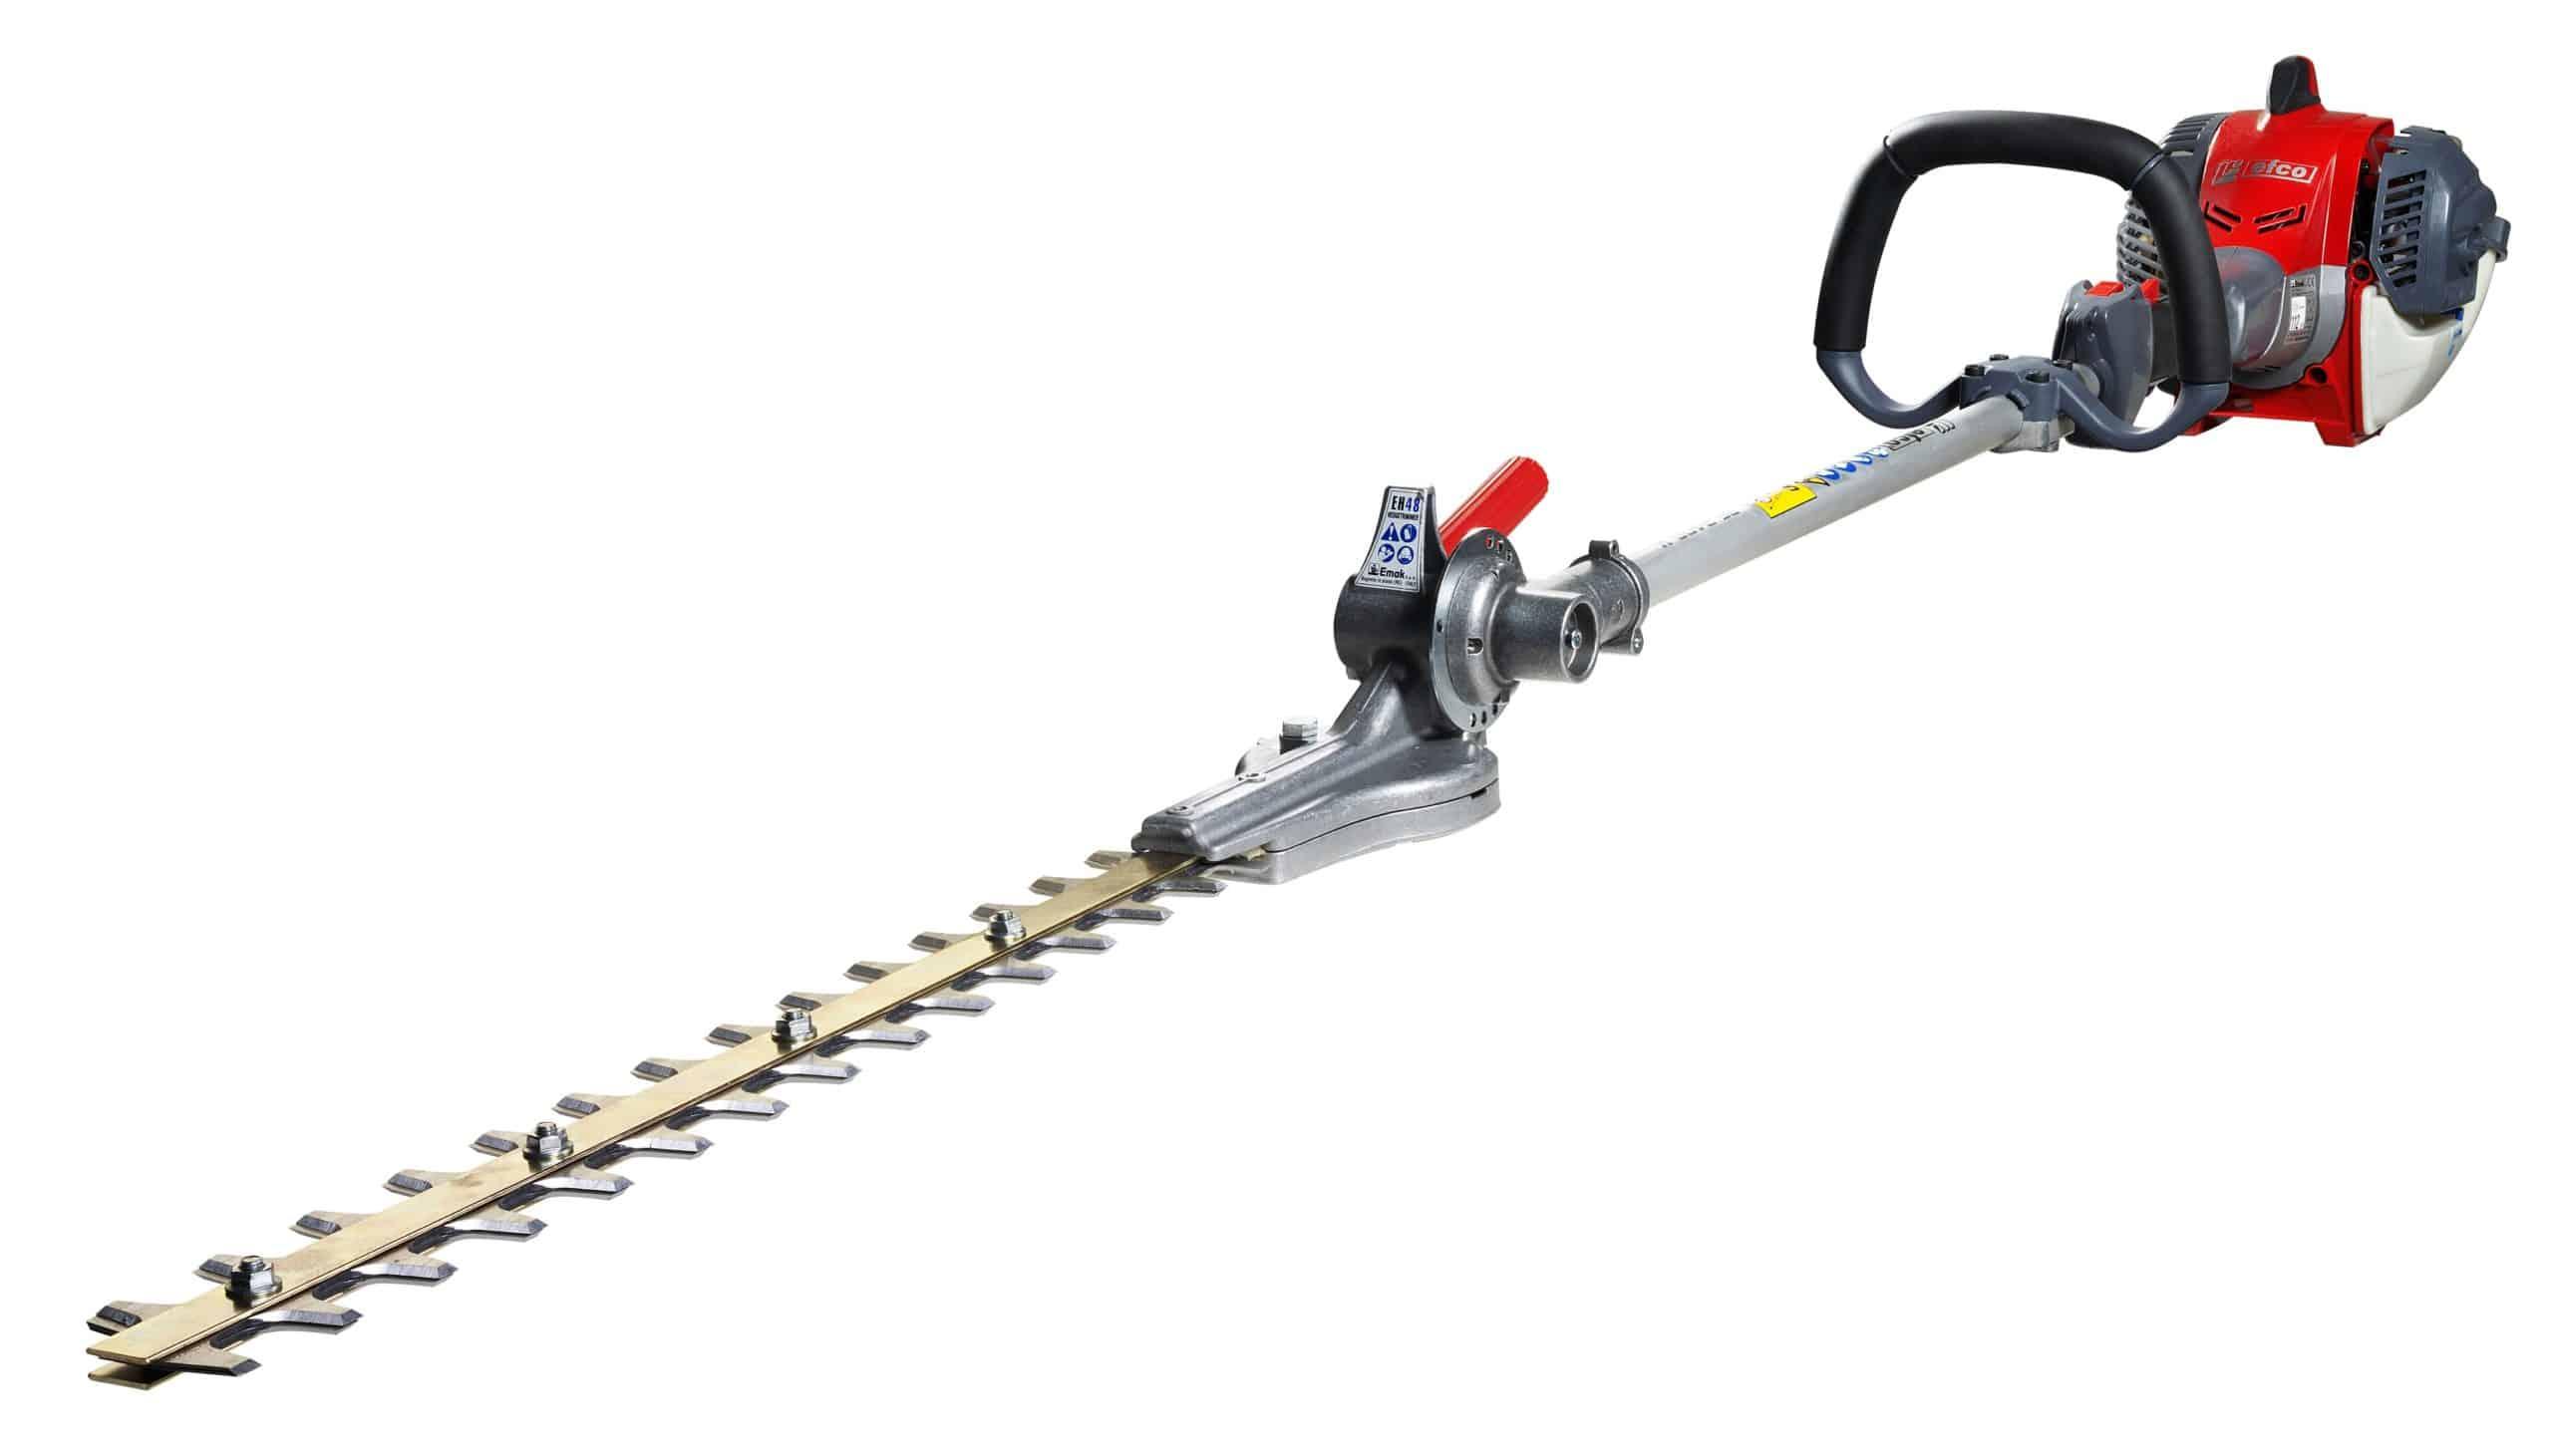 "Efco DS2400 H 20"" Long Reach Hedge Trimmer"